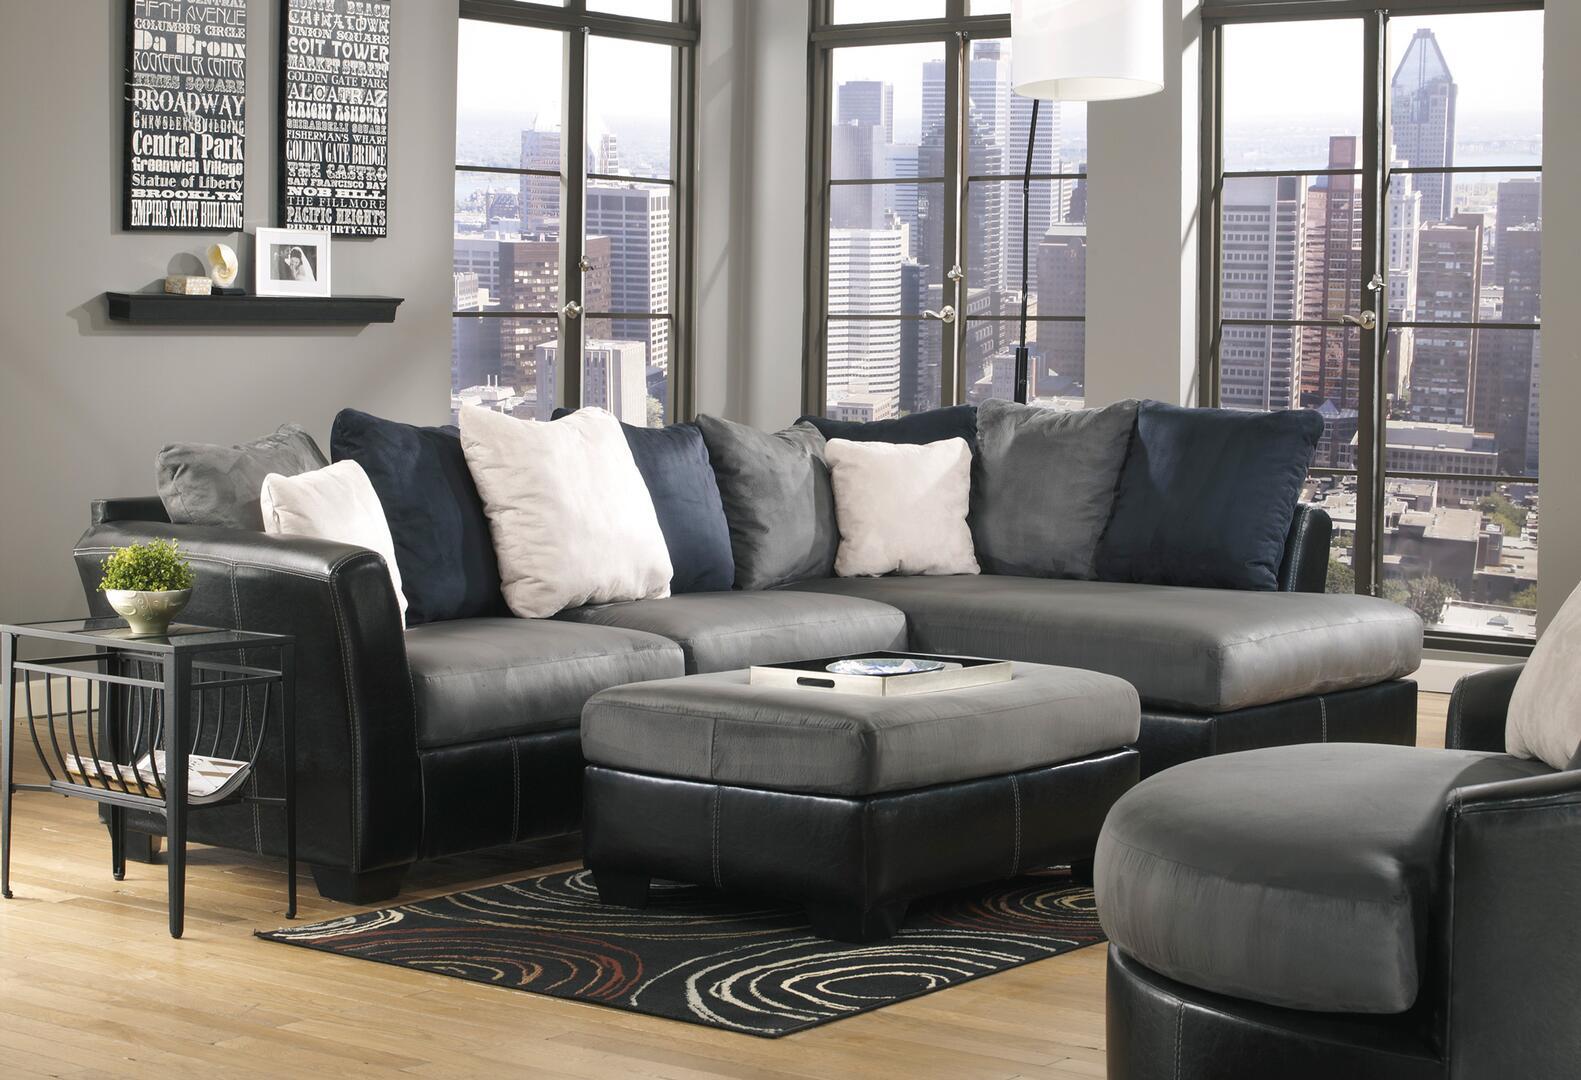 Benchcraft 1420066173pckit2 masoli living room sets for Living room of satoshi tax